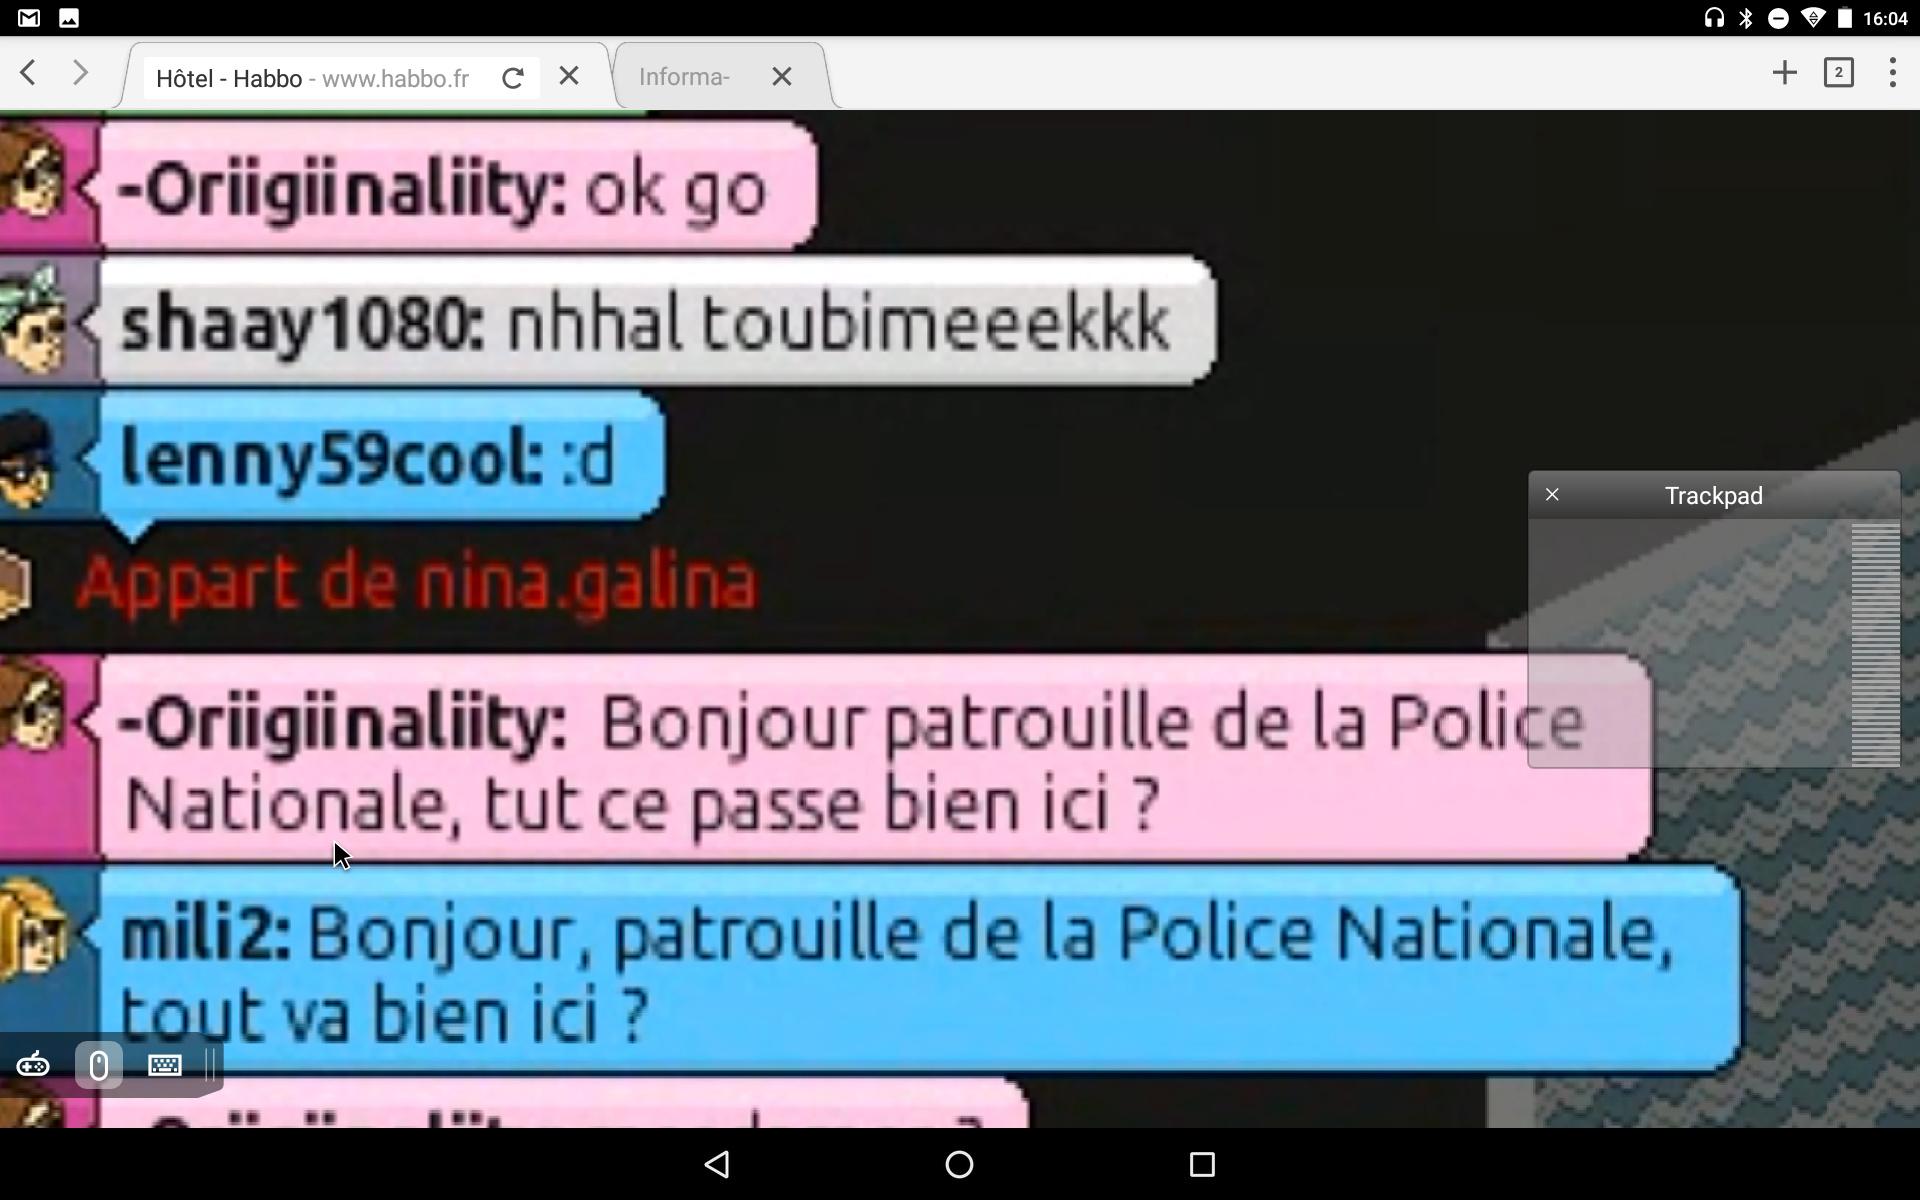 [P.N] Rapports de patrouilles d'-Oriigiinaliity Screen36